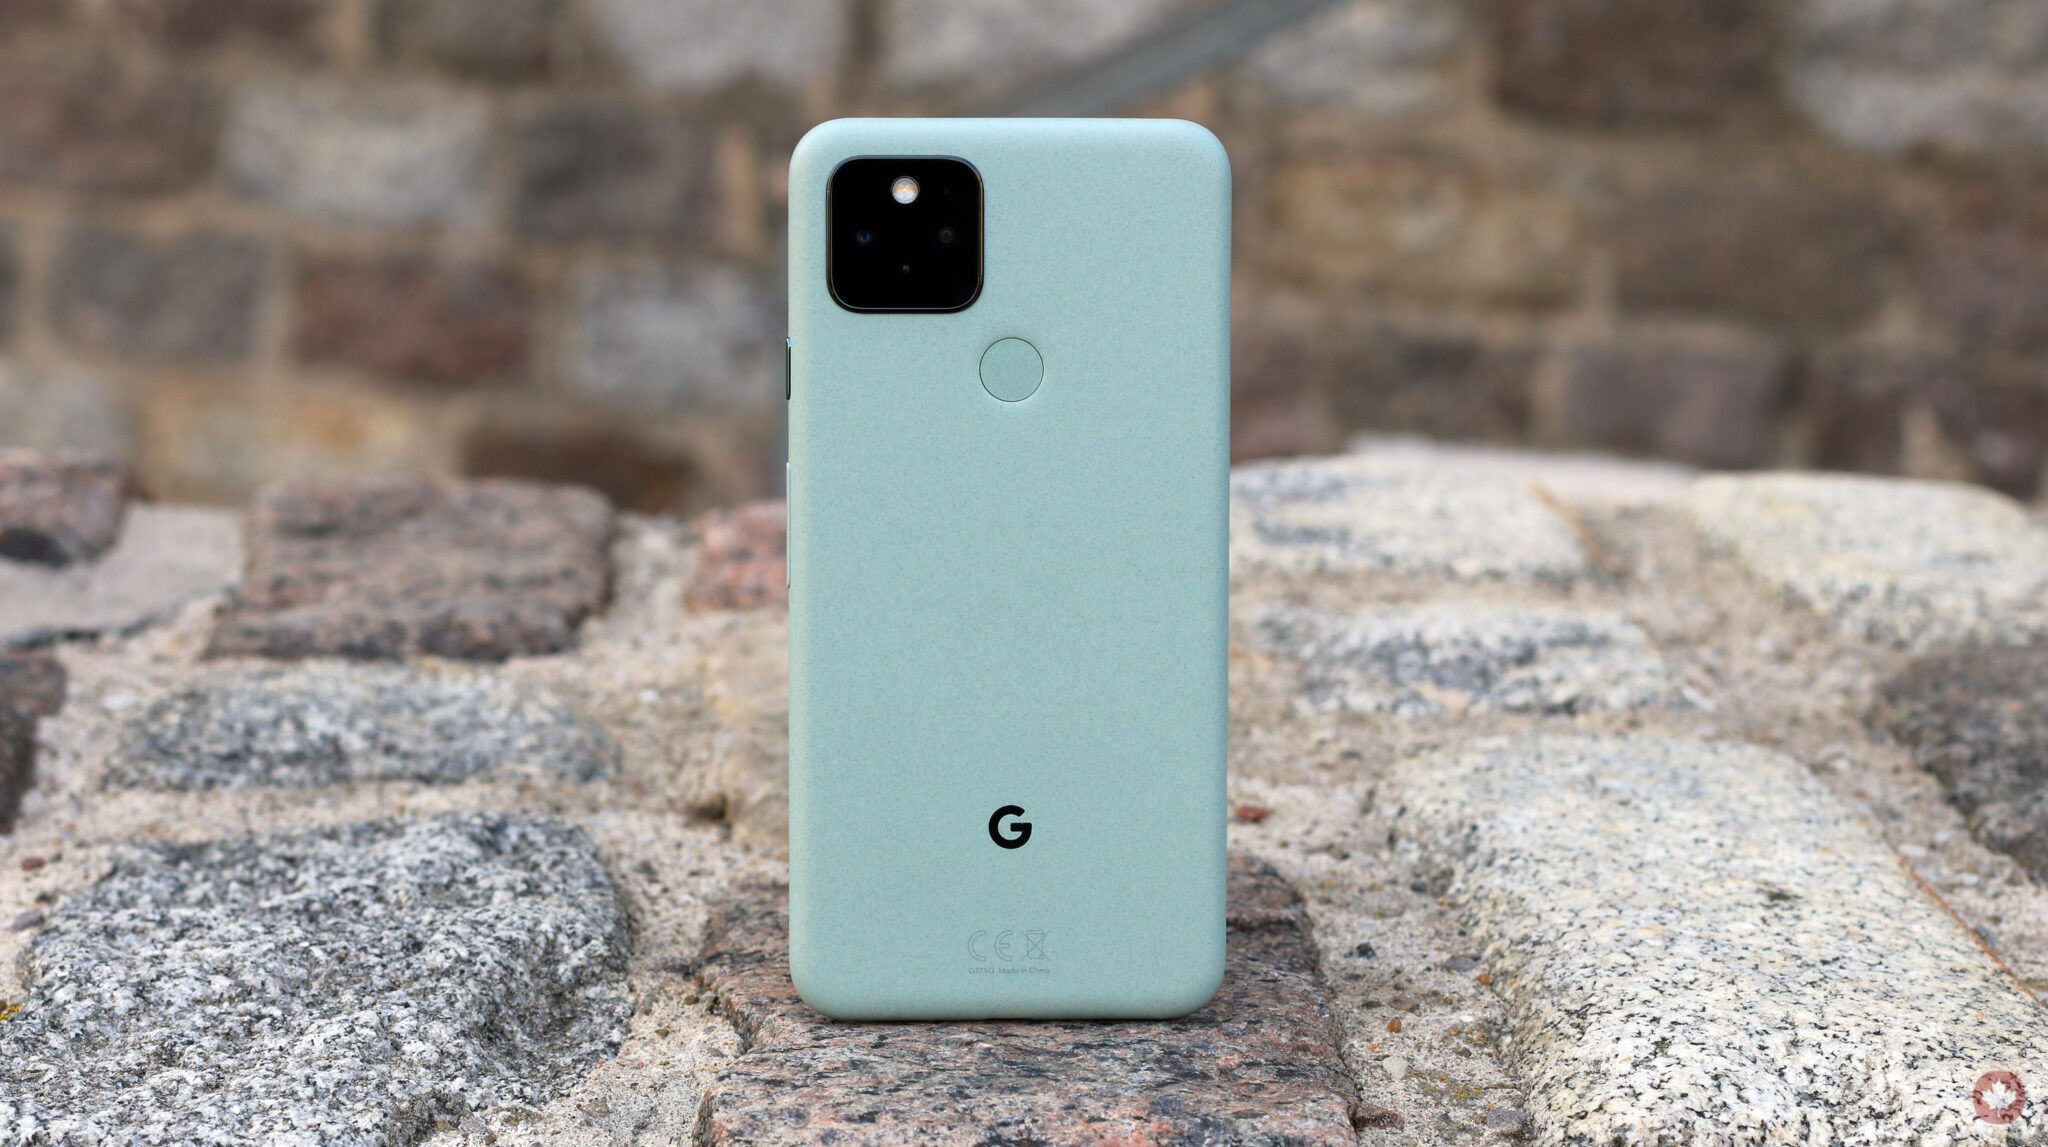 Pixel 6 could feature custom Google 'Whitechapel' processor